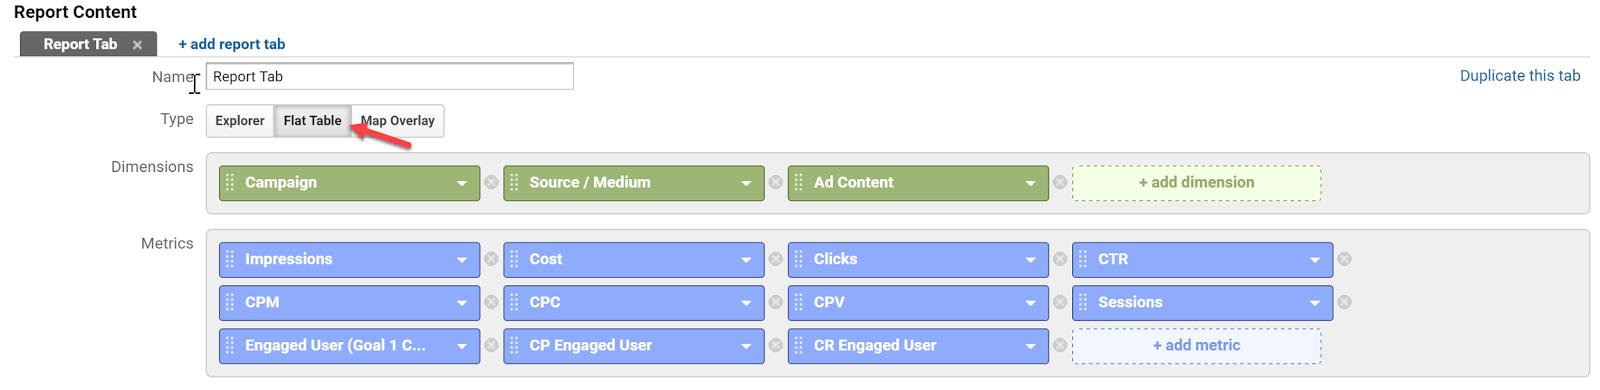 google analytics custom reports metrics dimensions